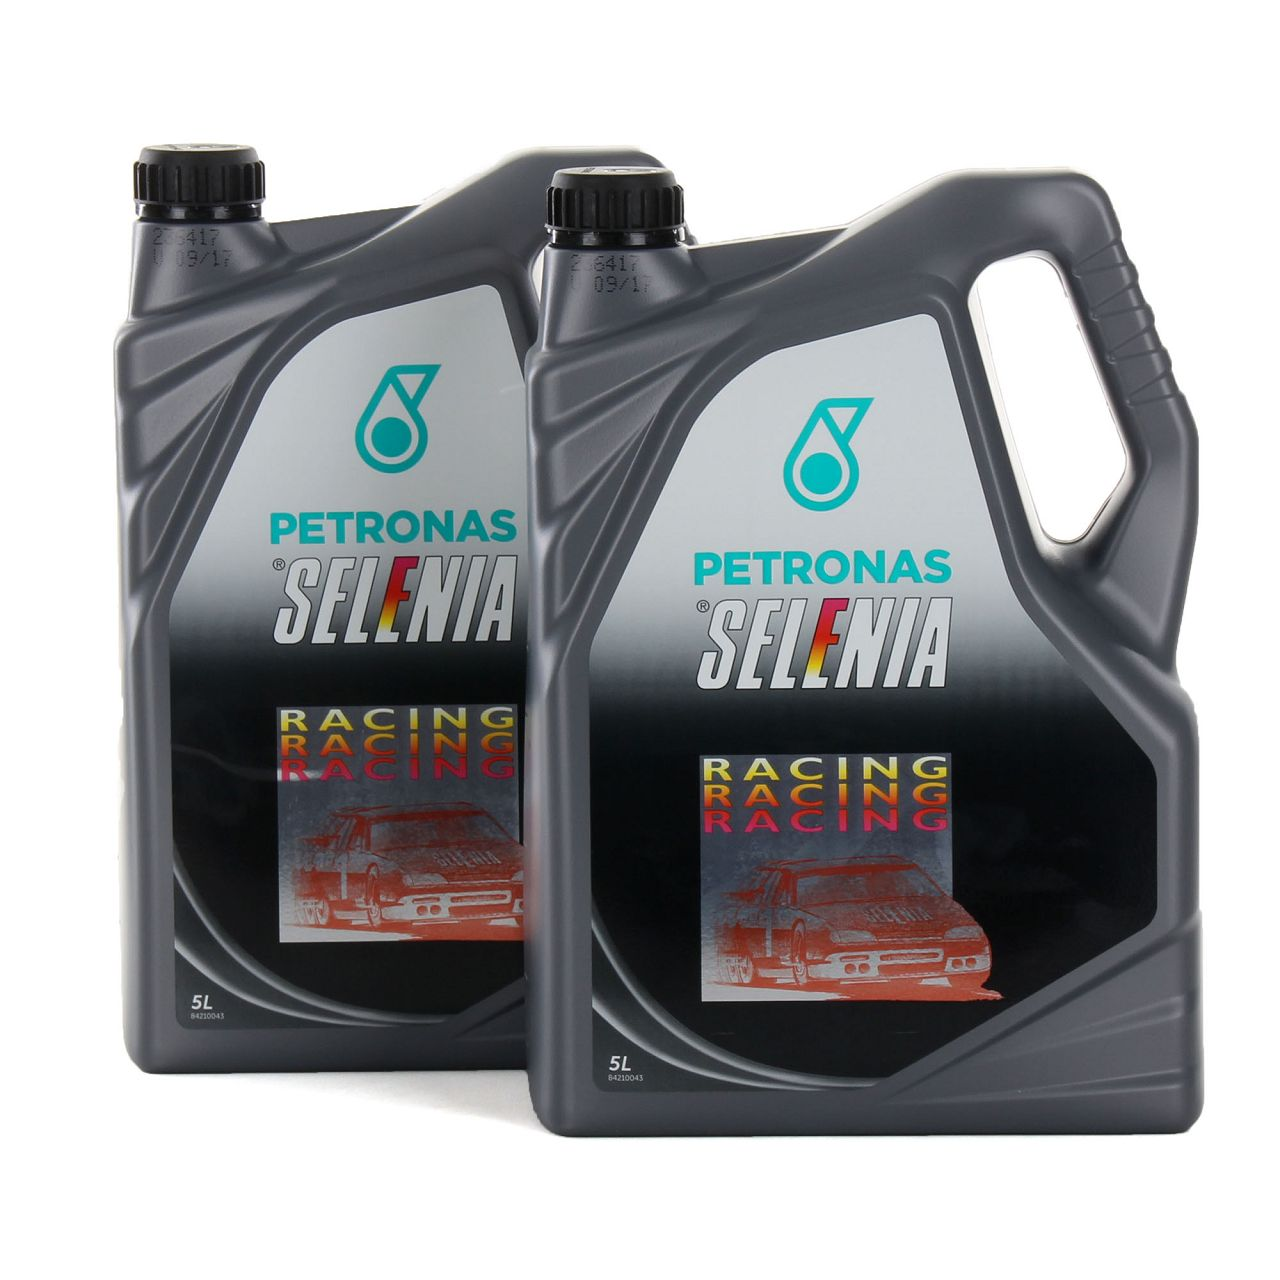 PETRONAS SELENIA Motoröl Öl RACING 10W60 10W-60 Alfa Romeo JTS, GTA - 10 Liter